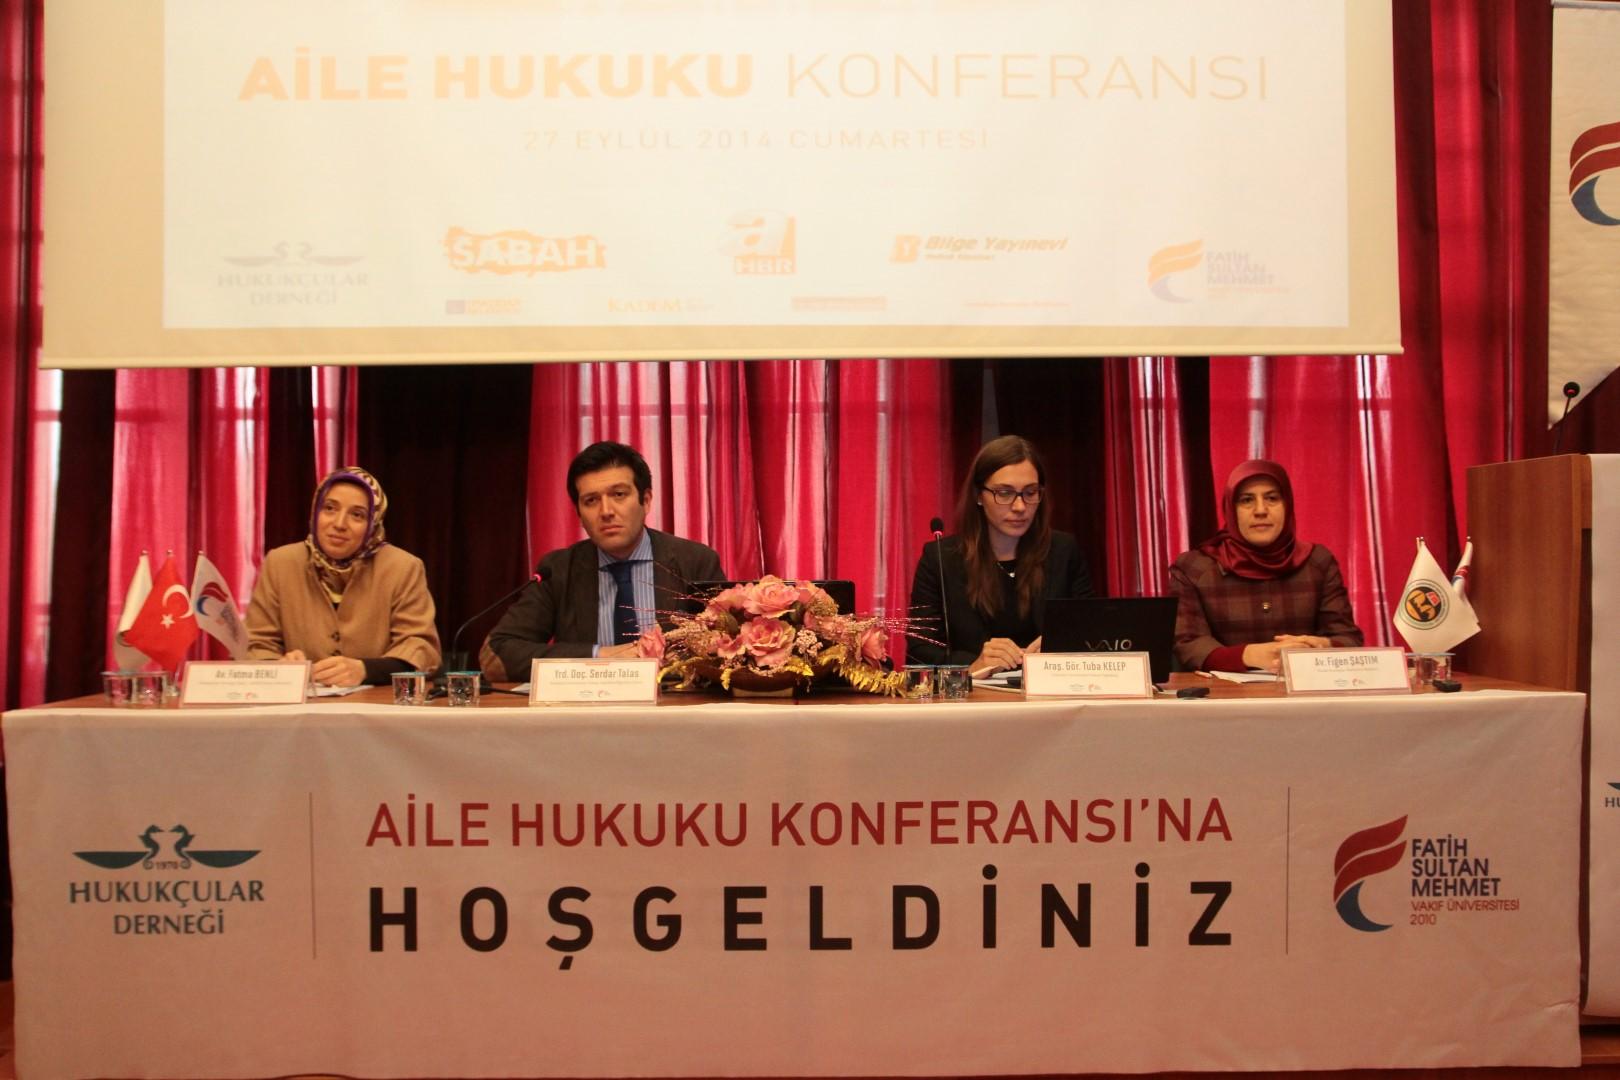 http://hukuk.fatihsultan.edu.tr/resimler/upload/Aile-Hukuku-Konferansi-Yapildi-6300914.jpg